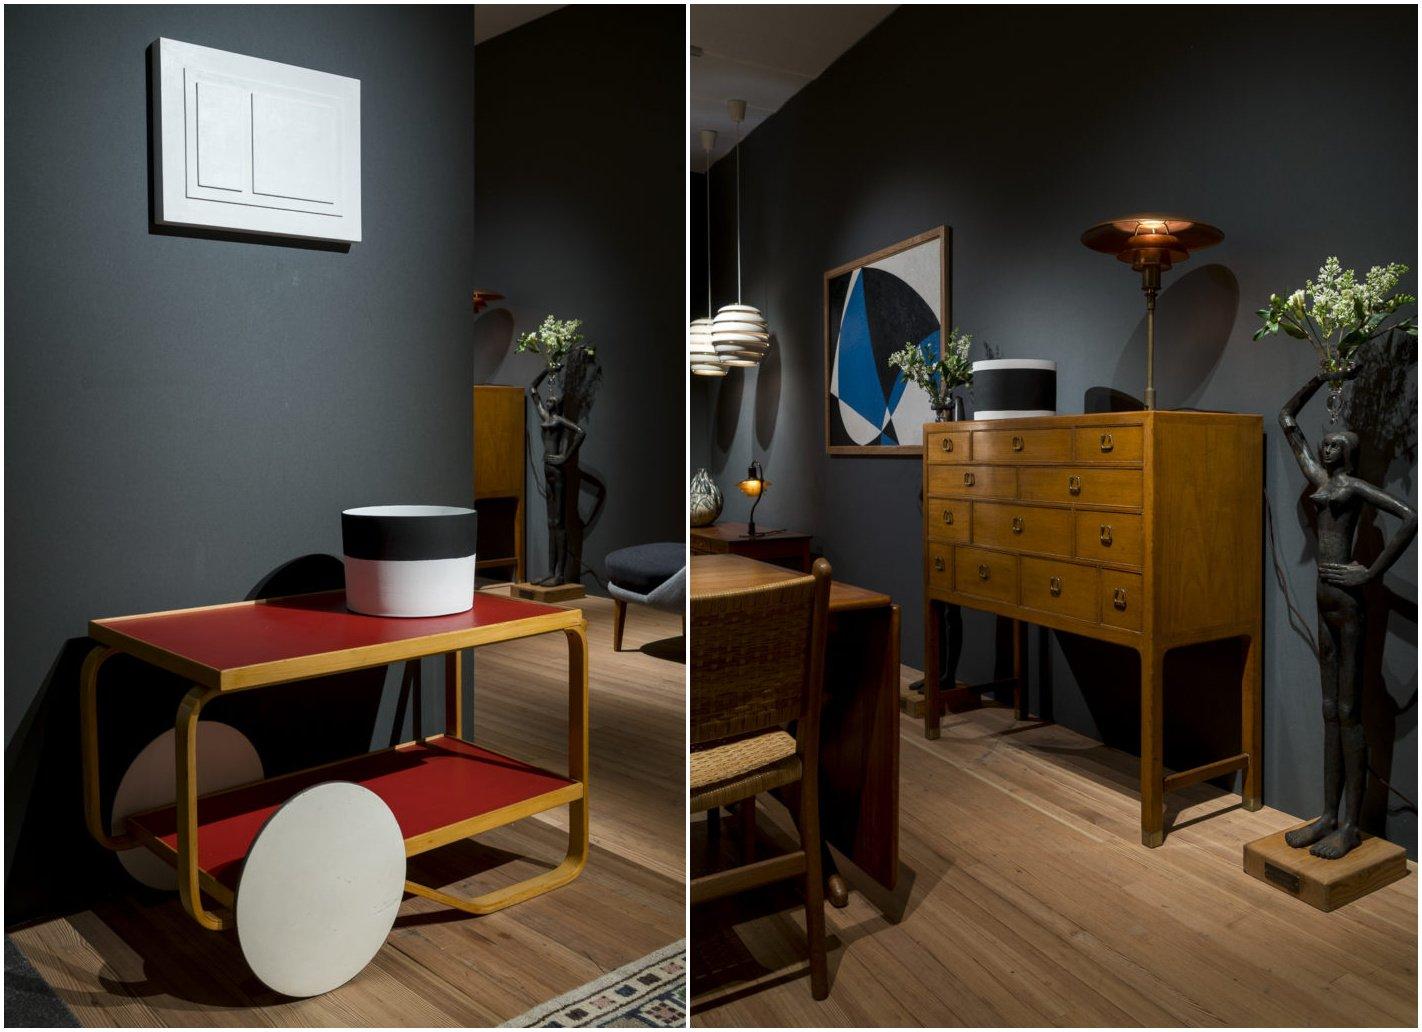 The-salon-art-design-18-04